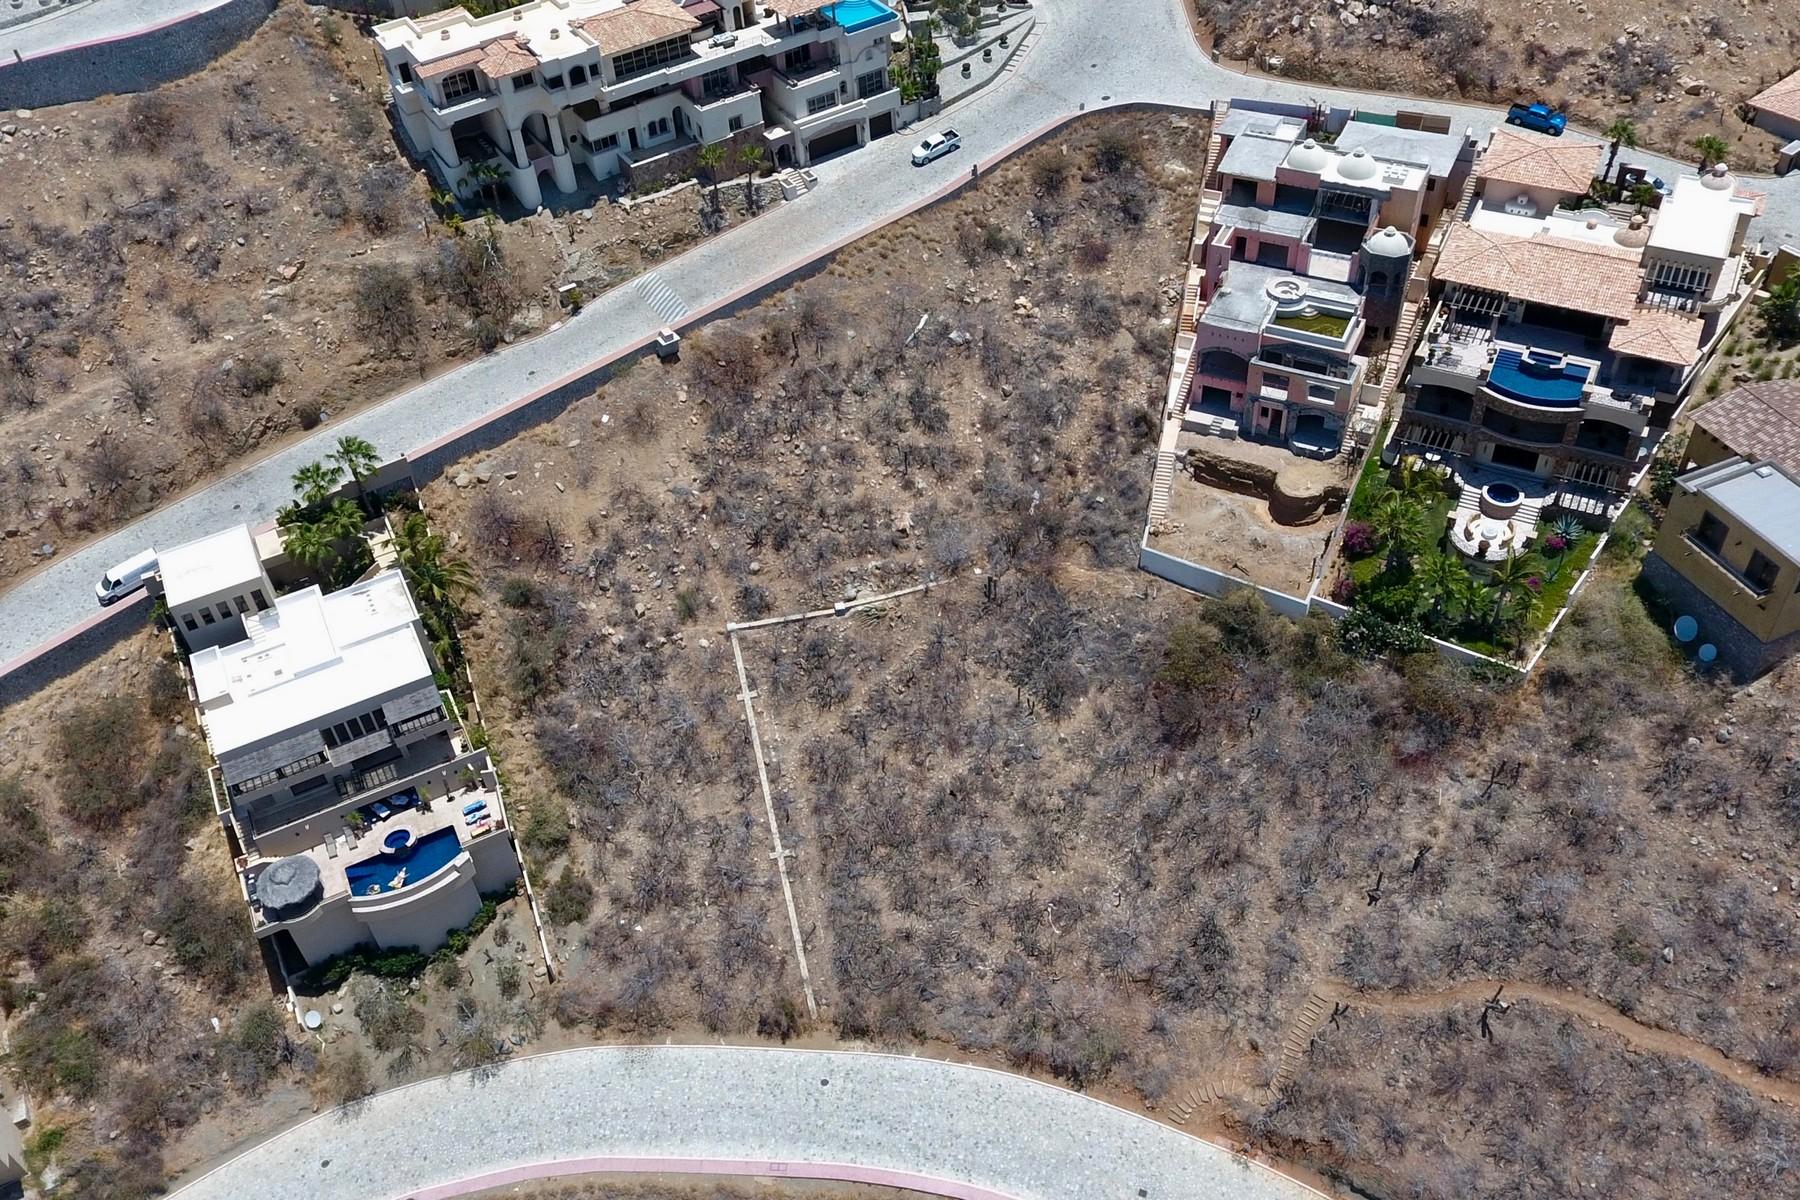 Additional photo for property listing at Lote 123 A, Manzana 17 Fraccionamiento Pedregal de Cabo San Lucas Lote 123 A, Manzana 17 Cabo San Lucas, Baja California Sur 23450 Mexico